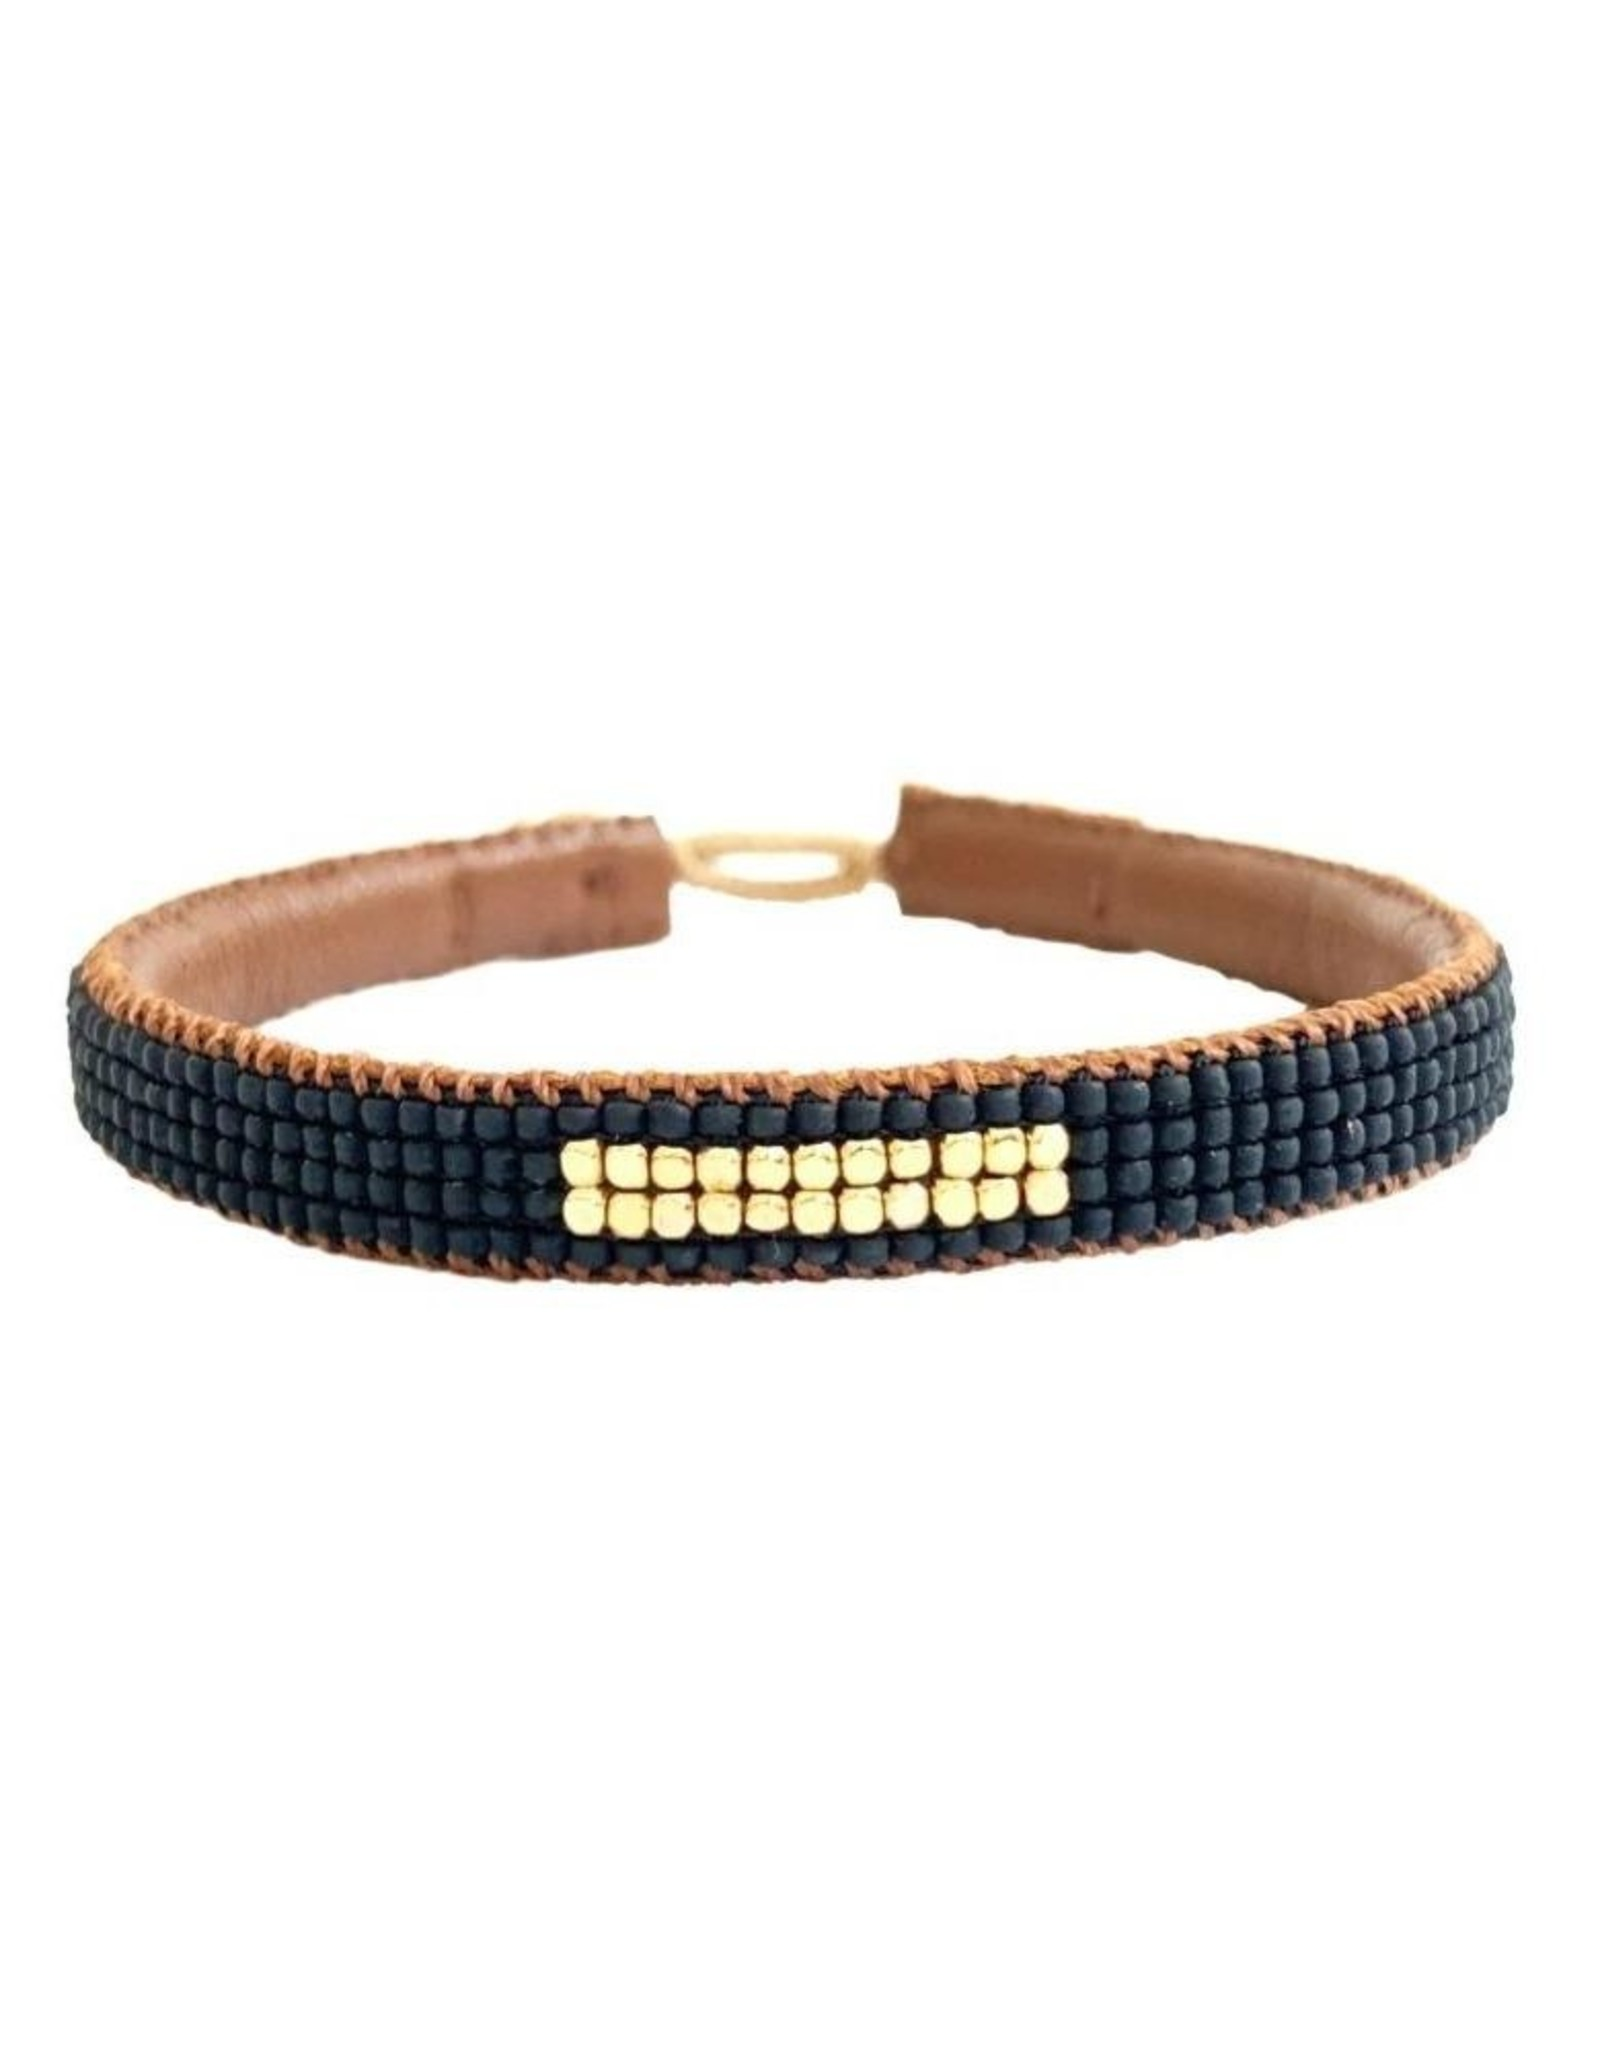 Ibu jewels armband gold bar ibu juwels